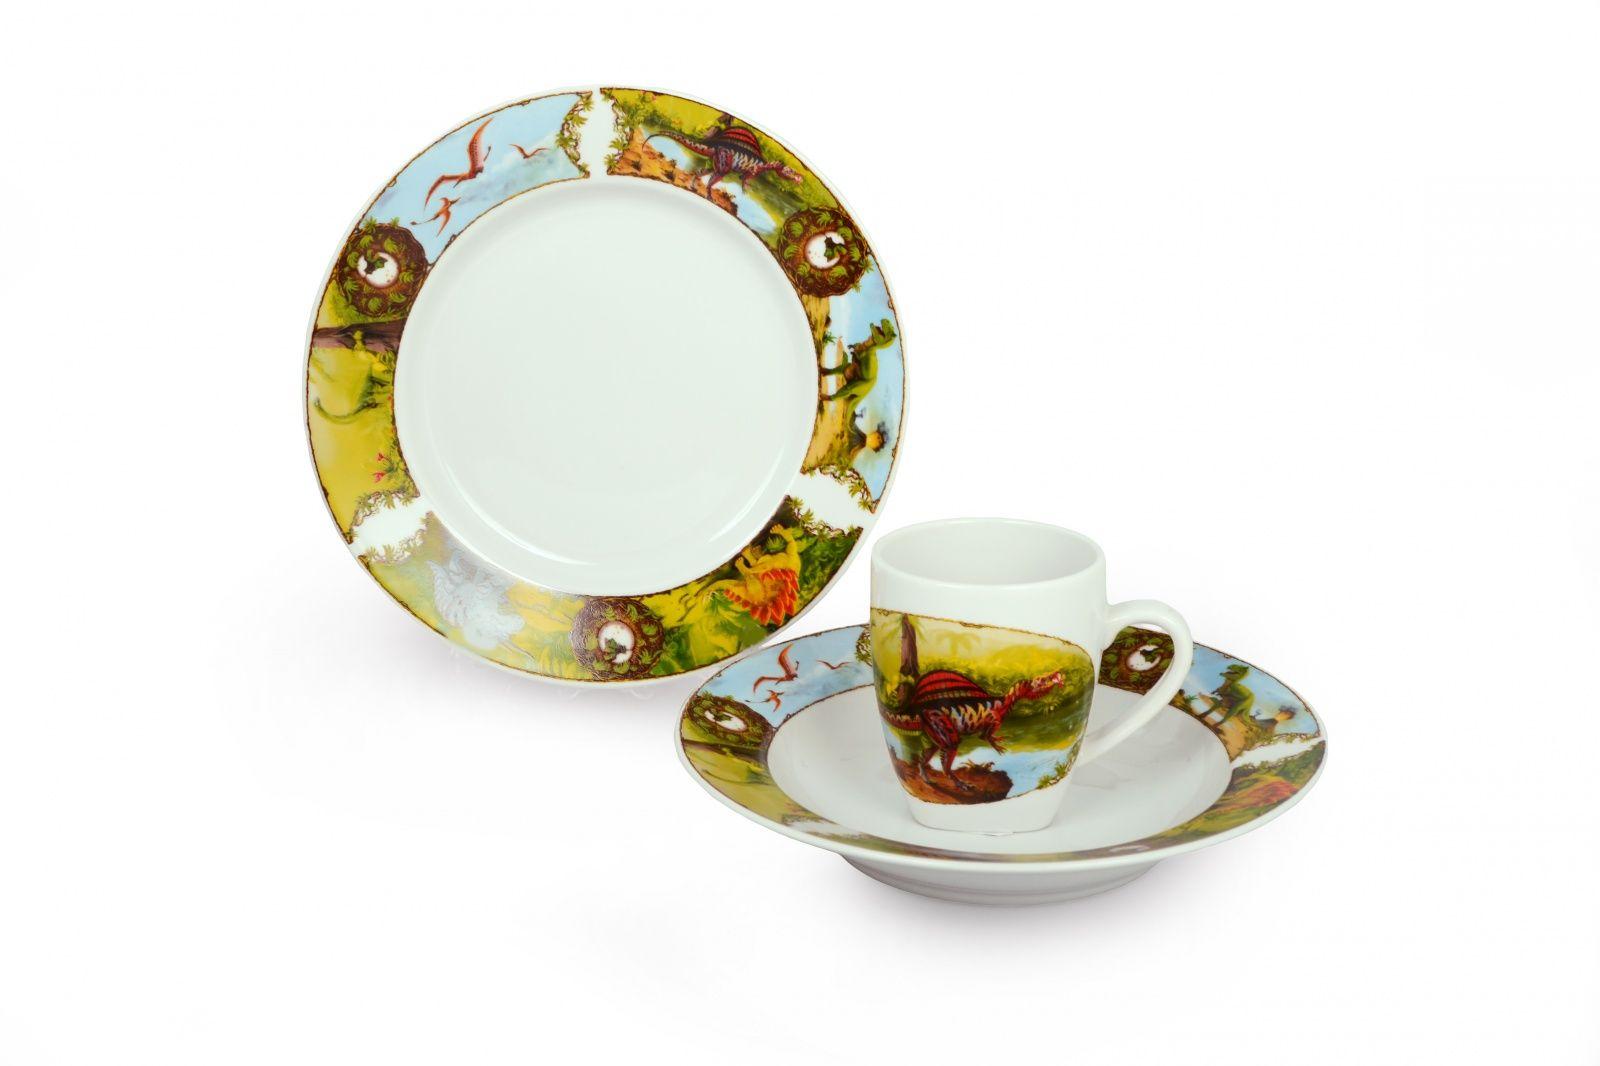 Dulevo porcelain / A set of dishes 3 ave.Dinosaurs (t. 200 mm chalk, t. Depth 200 mm, mug 210 ml Gloria)